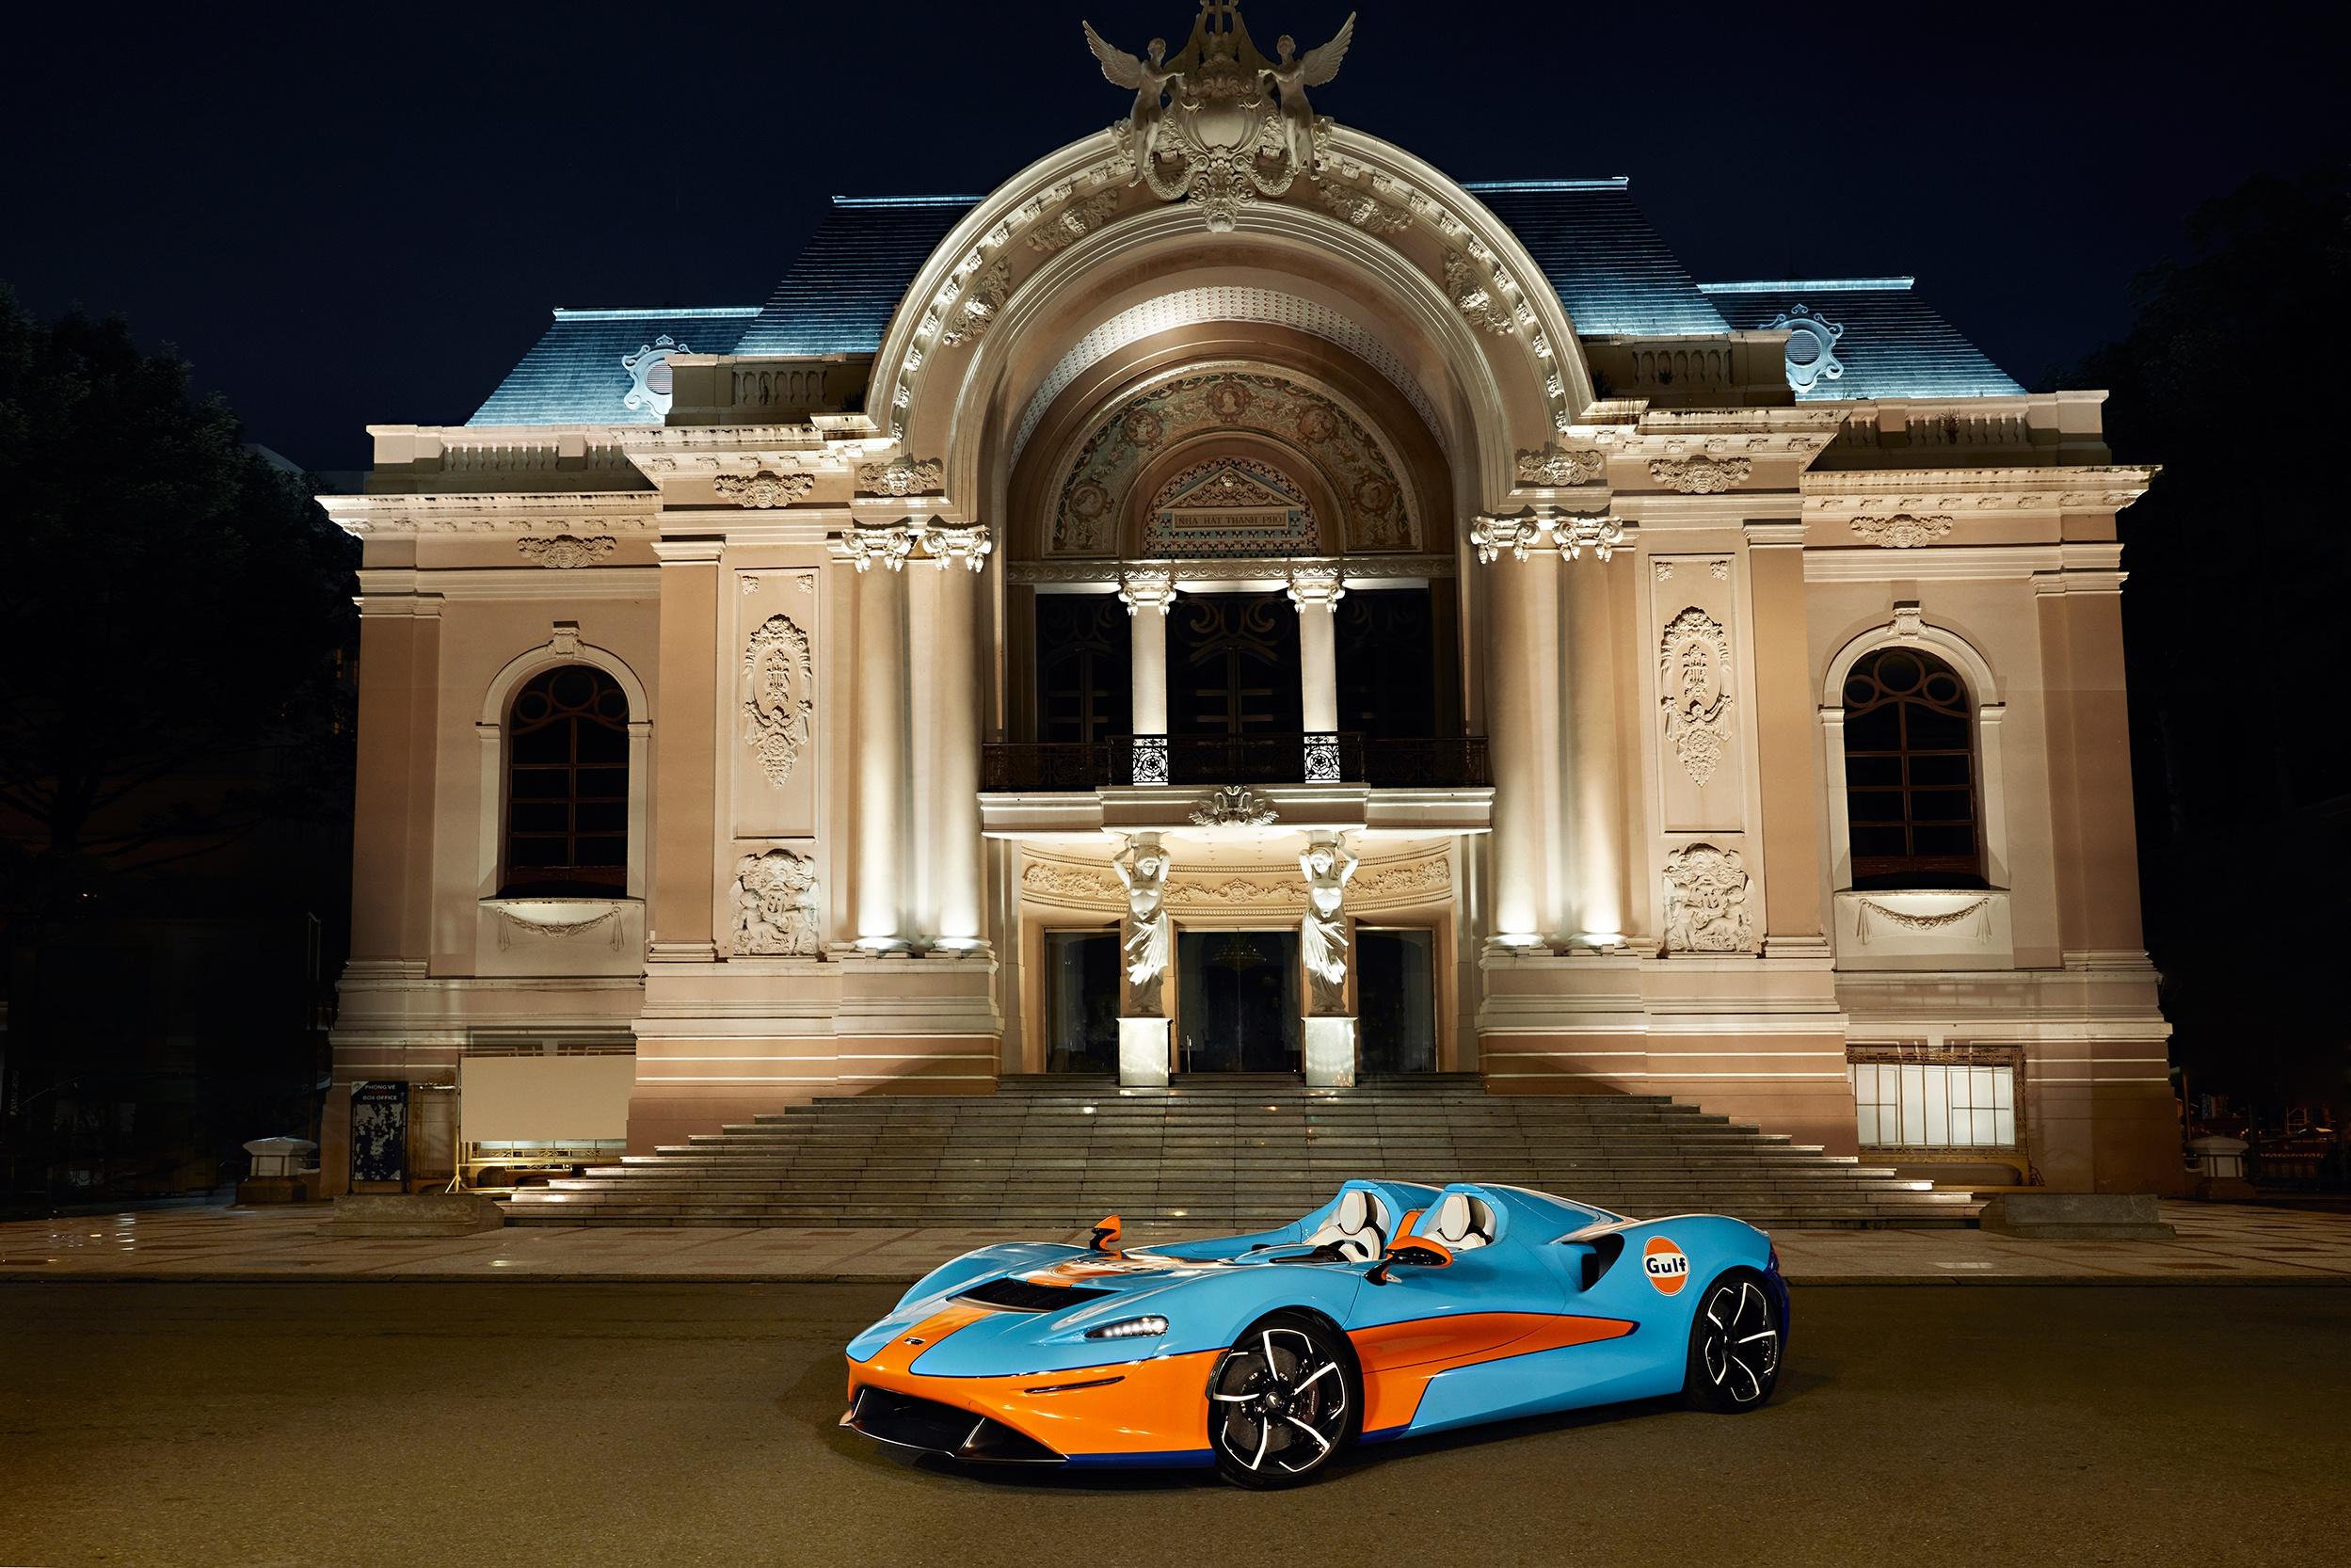 McLaren Elva xuat hien tai TP.HCM cung Minh Nhua anh 1